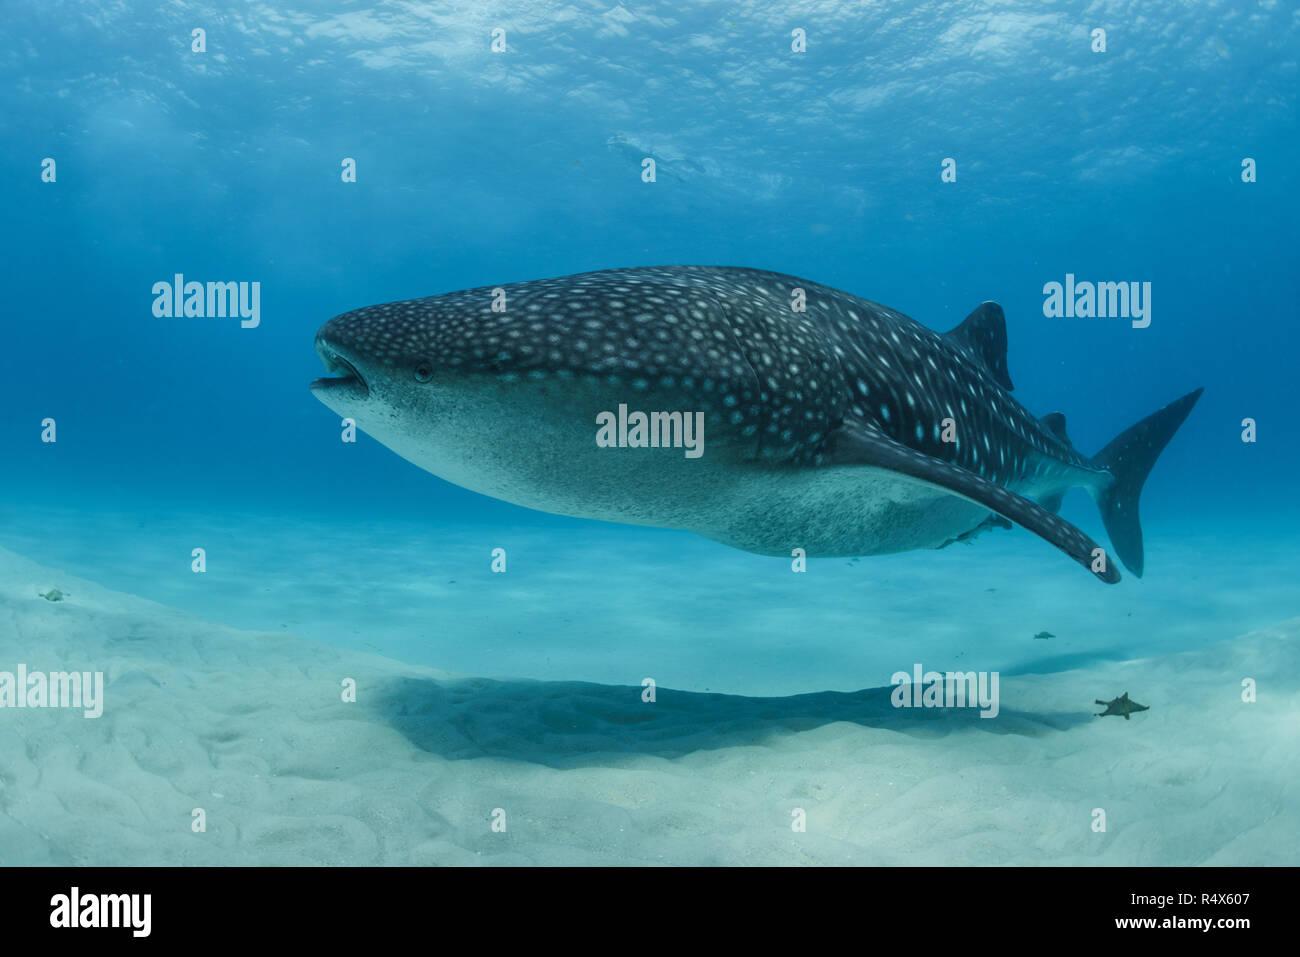 Whale shark swimming over a shallow sandbank at Mafia Island, Tanzania - Stock Image